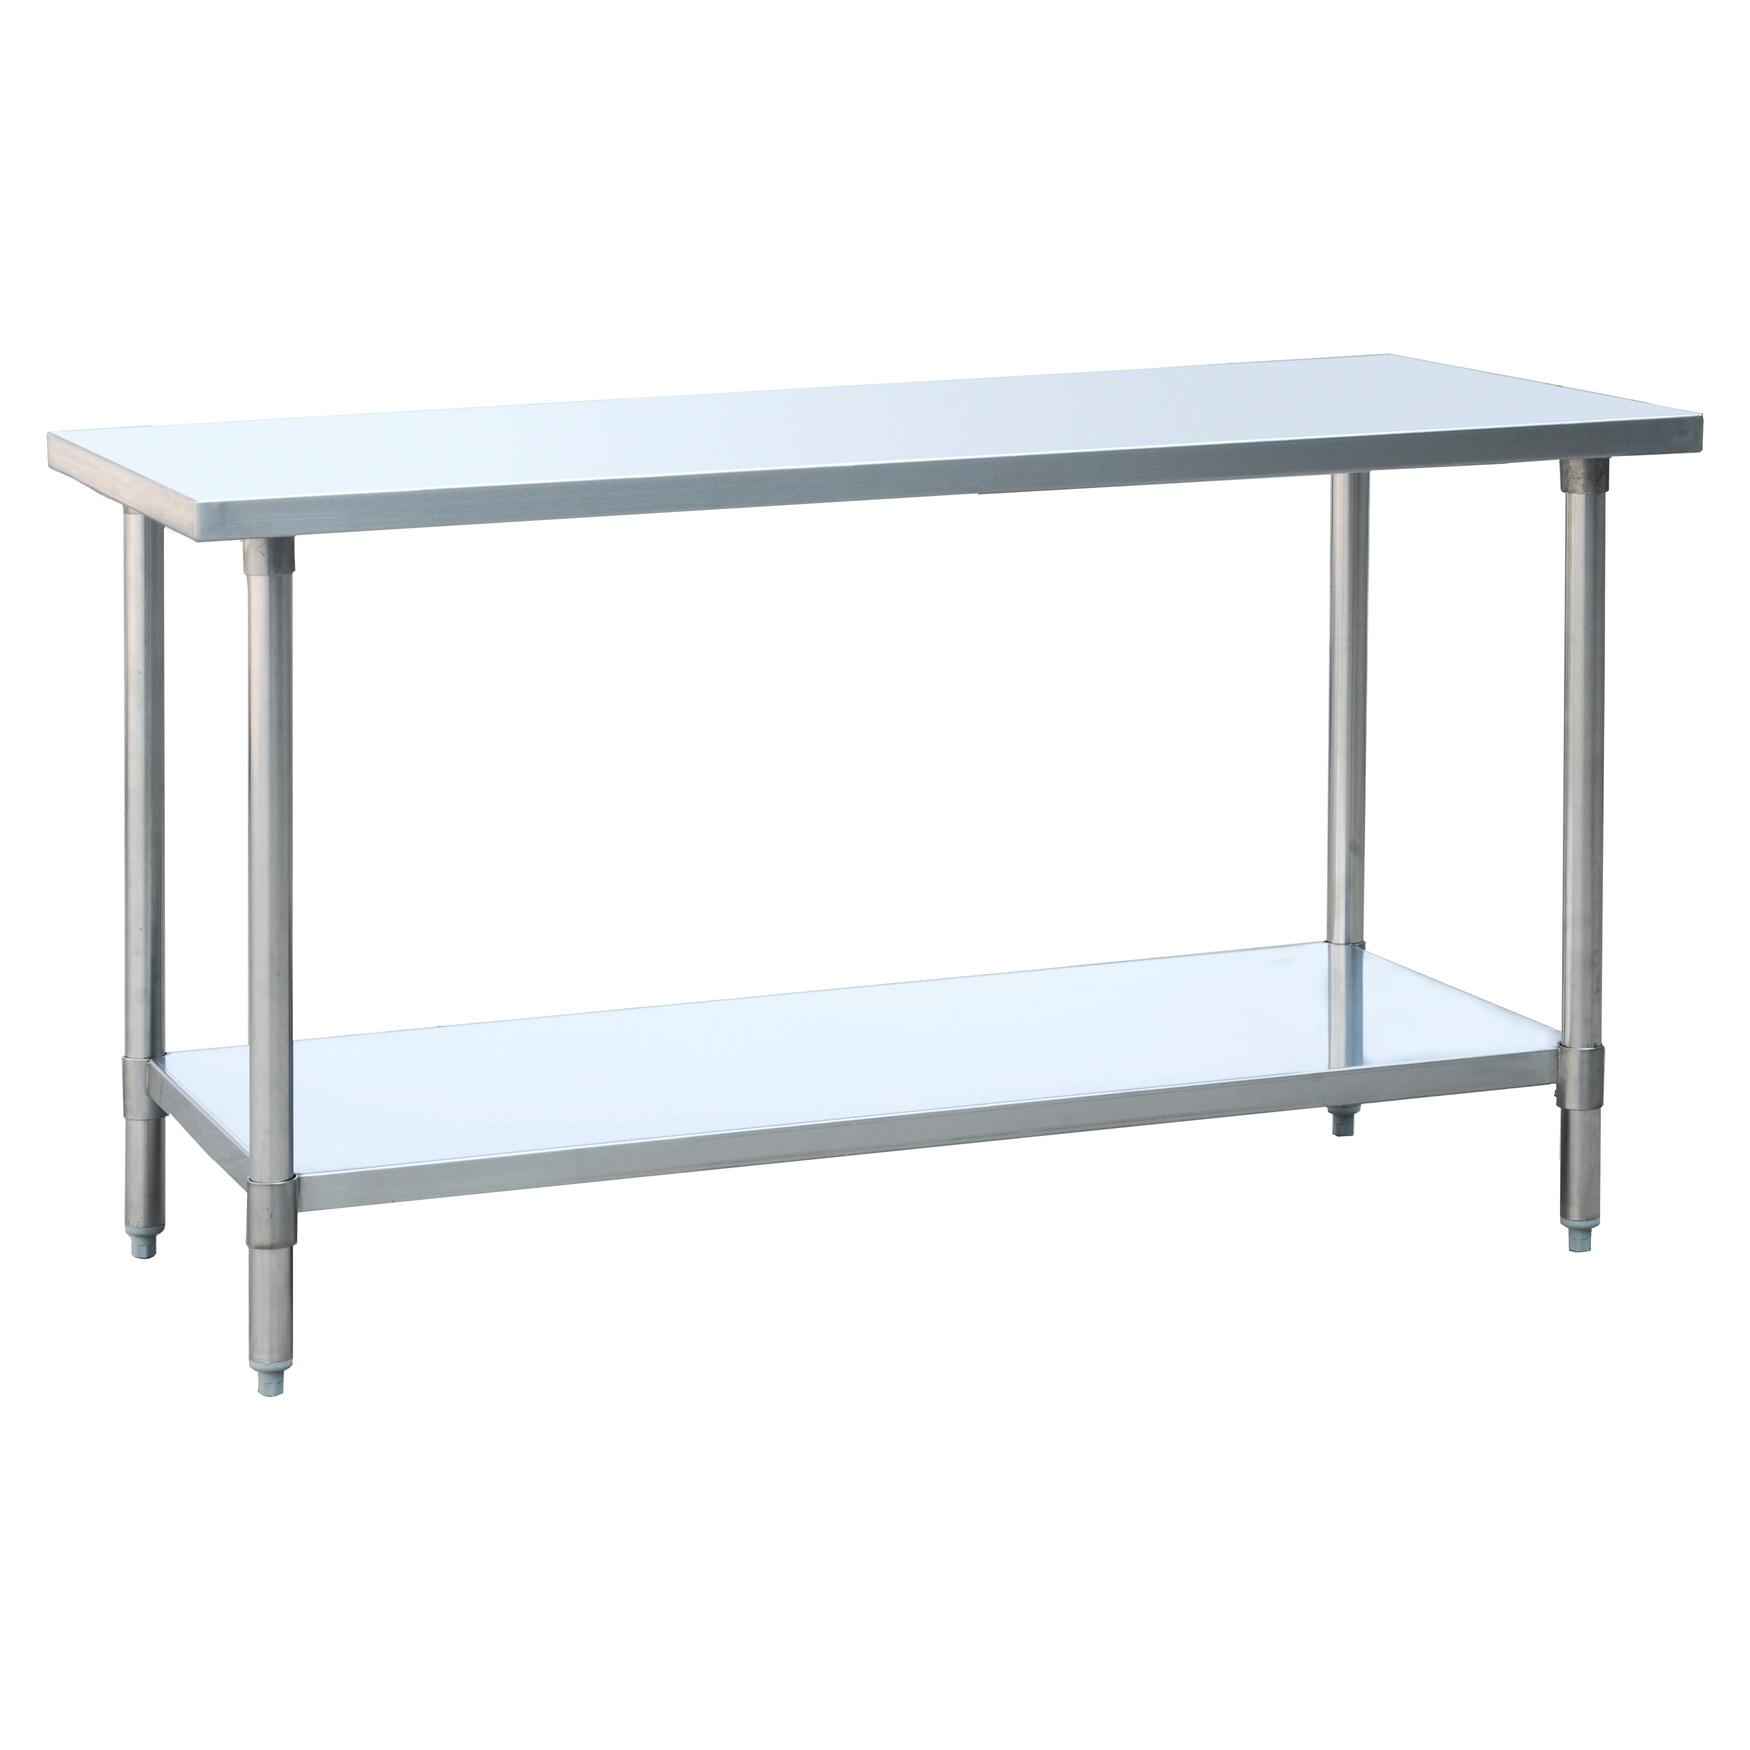 Atosa USA MRTW-2448 work table,  40